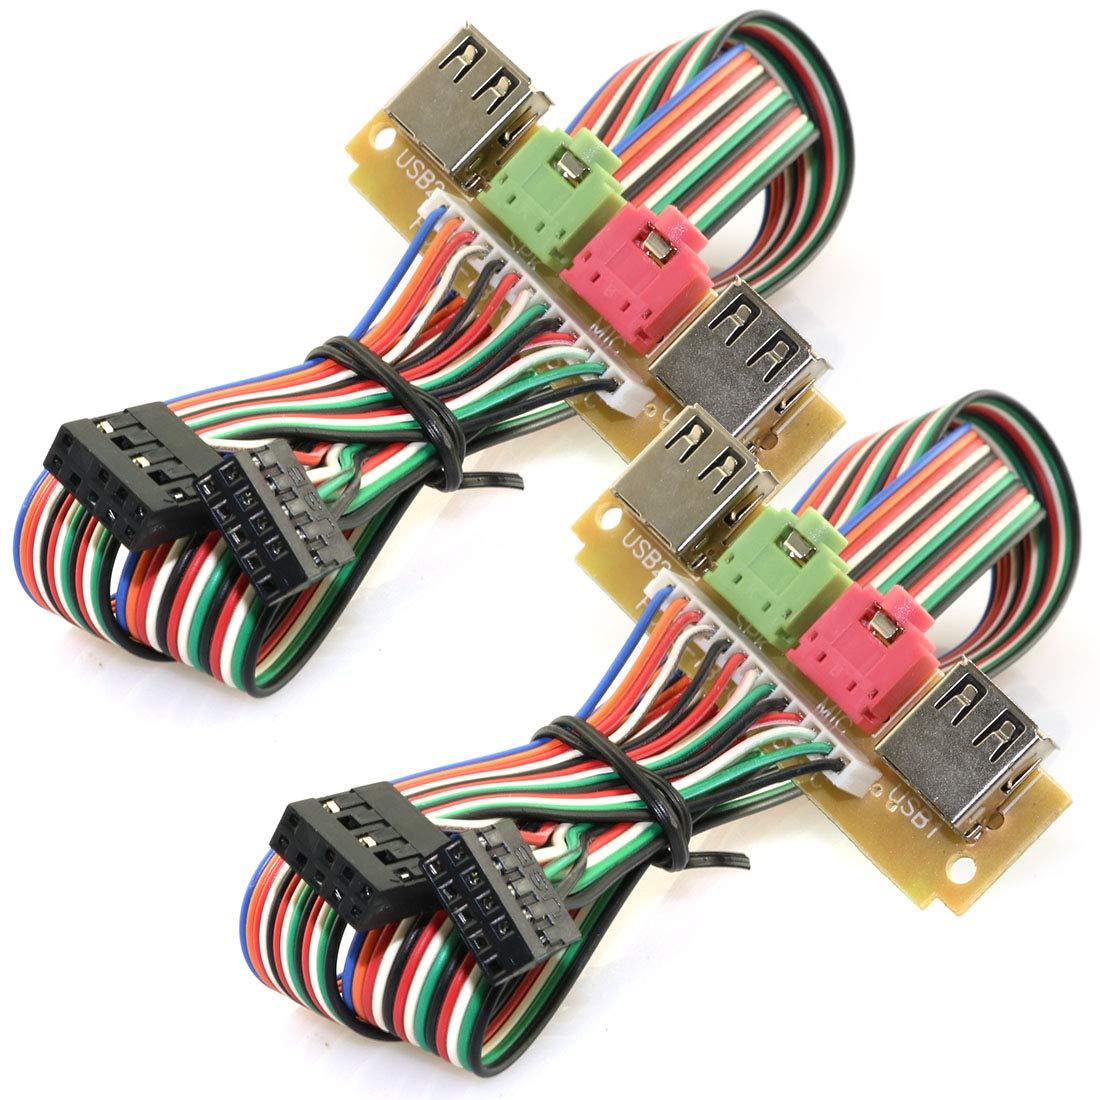 ToToT 2pcs USB Front Panel Cable HUB Computer Chassis Front Panel Desktop Audio Port Mic Earphone Cable Gadget 70cm Universal Edition